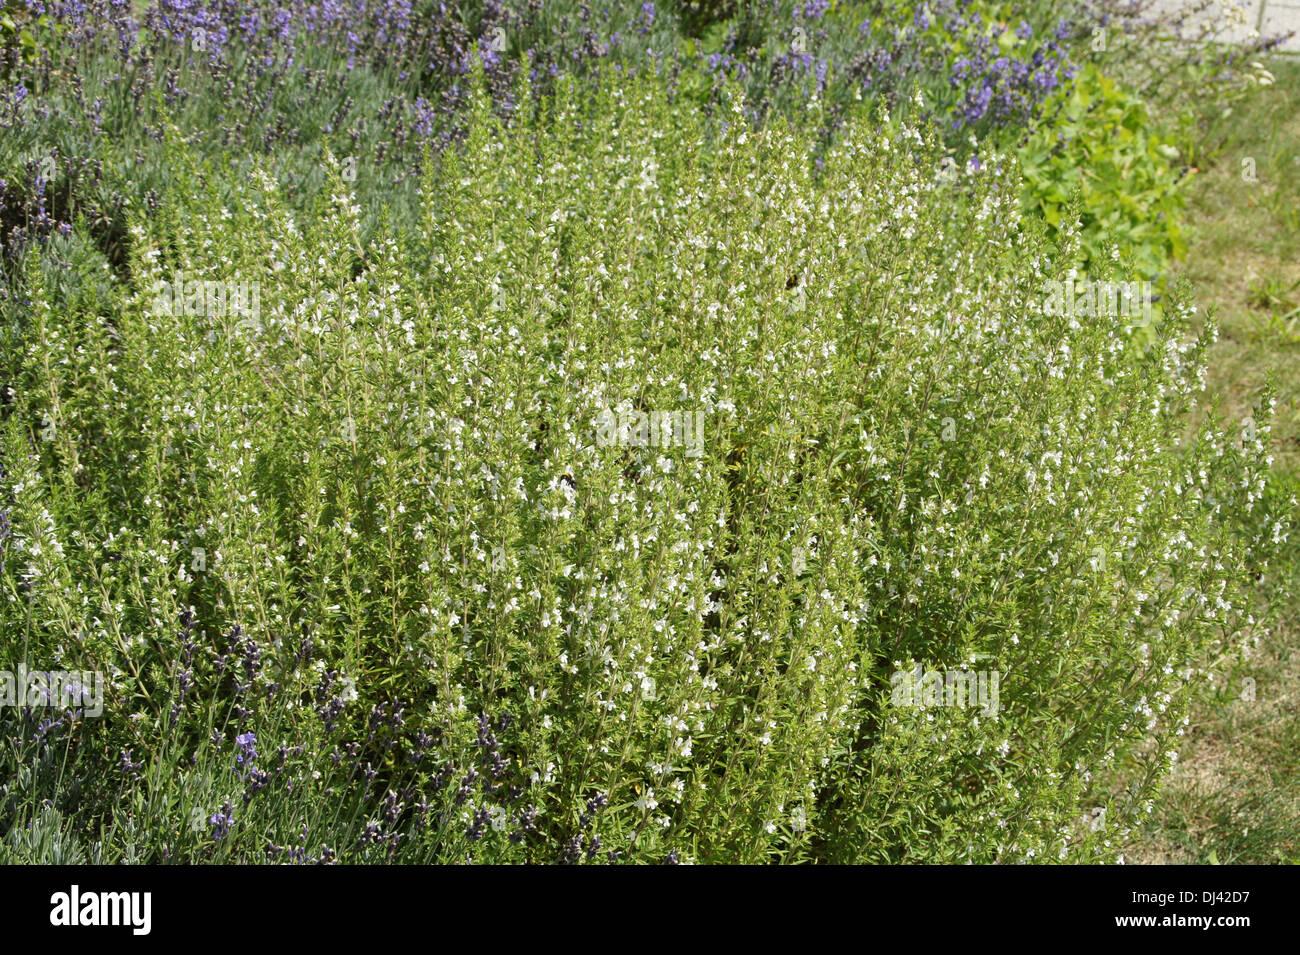 Winter Savory - Stock Image